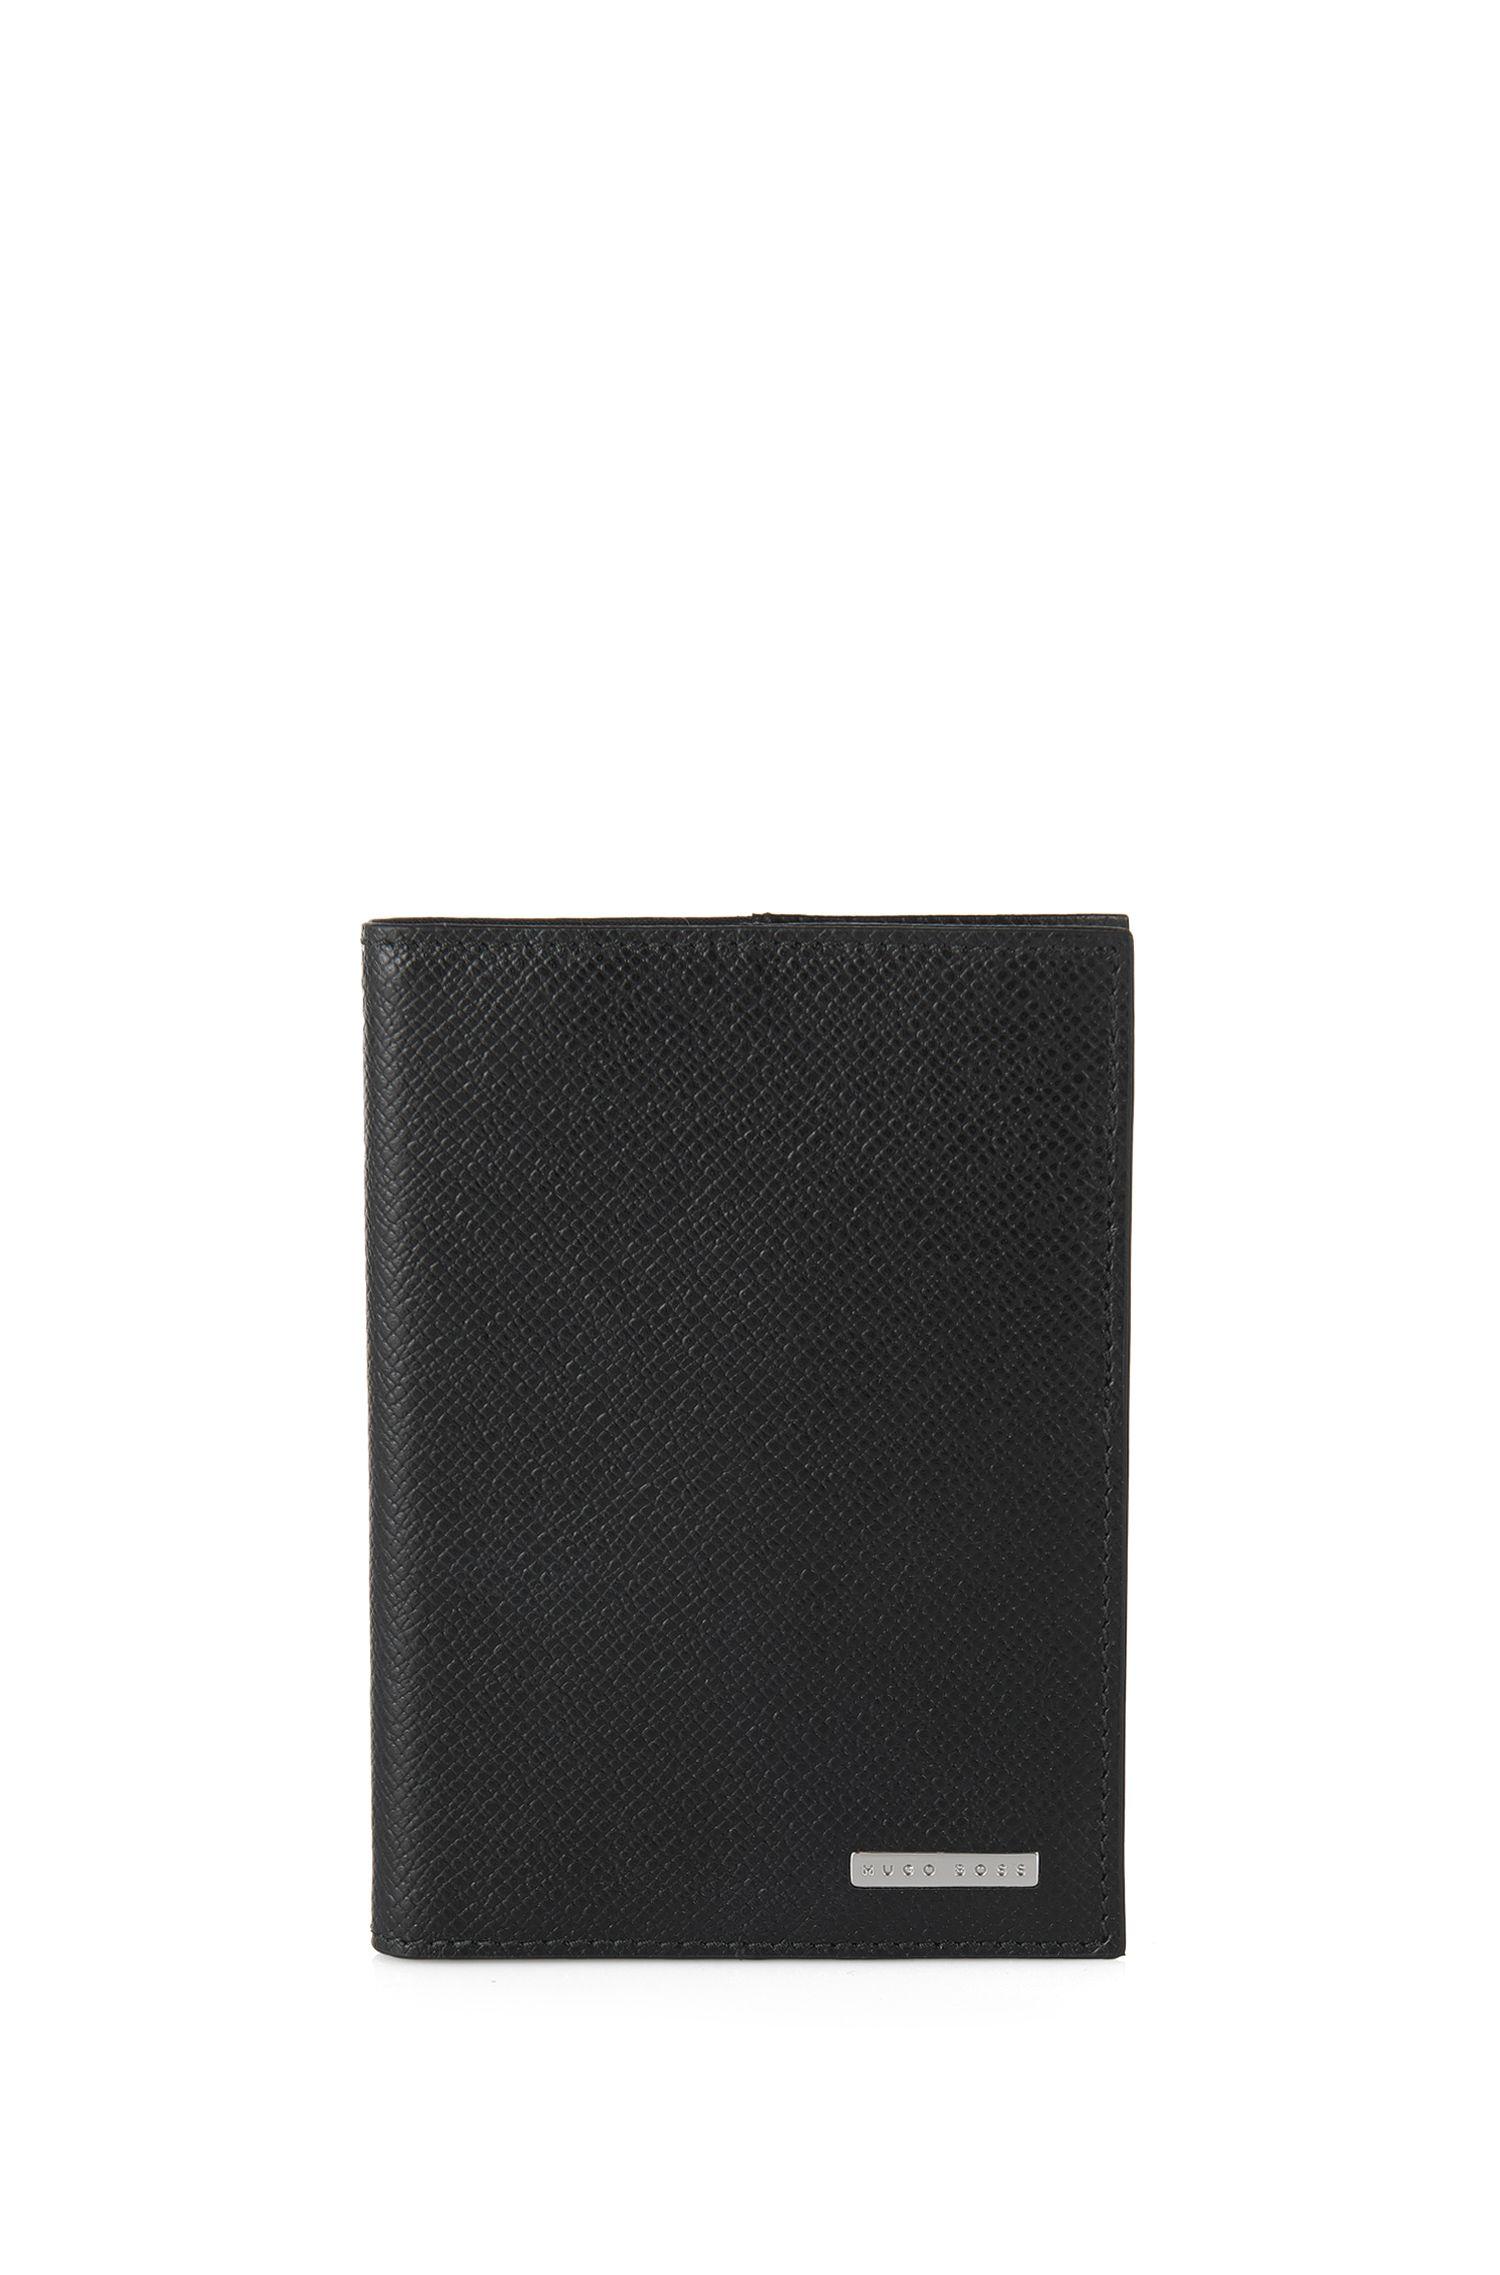 'Signature Passaport' | Leather Embossed Passport Sleeve